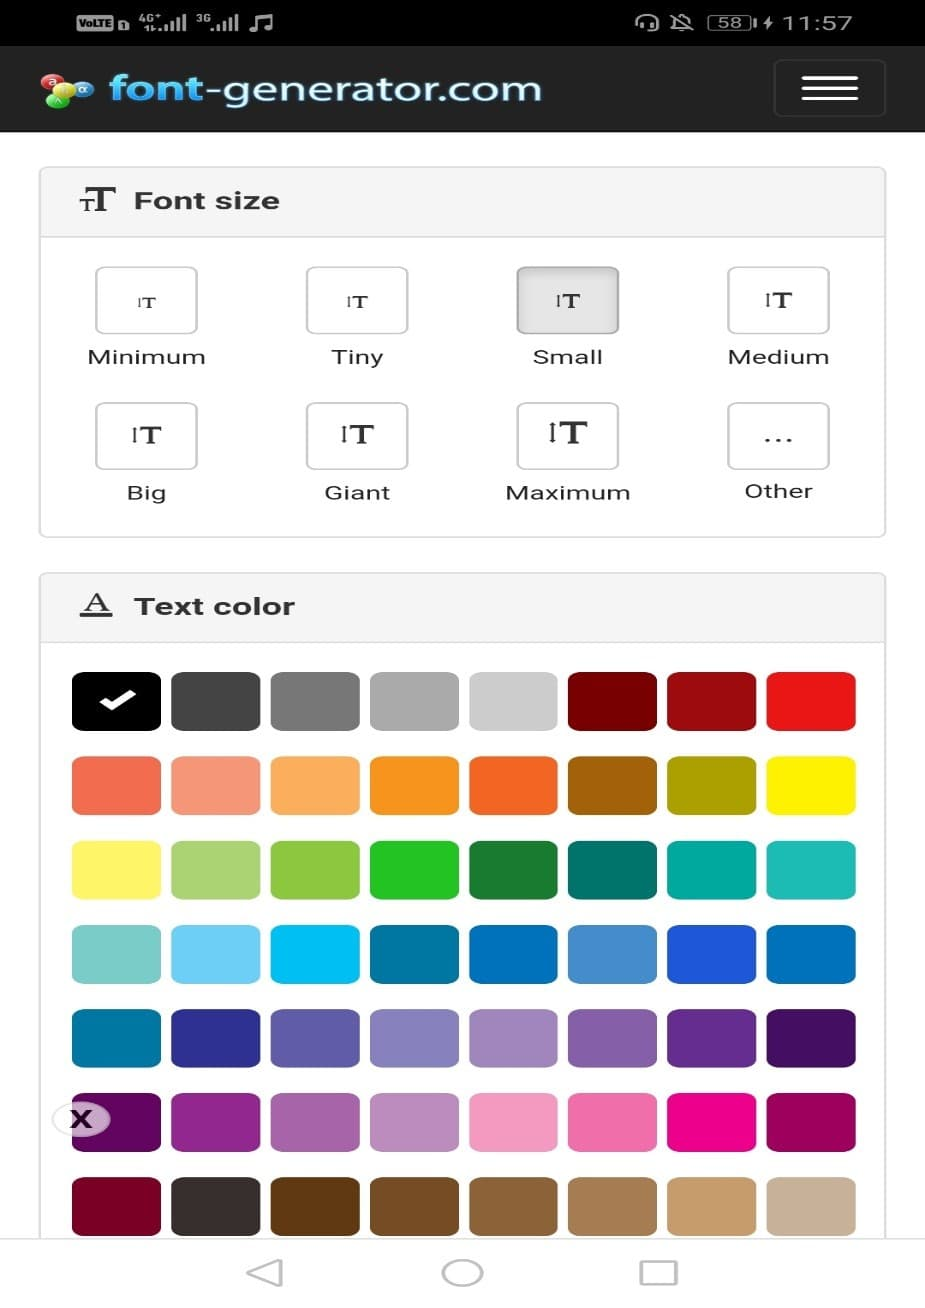 سایت font-generator.com